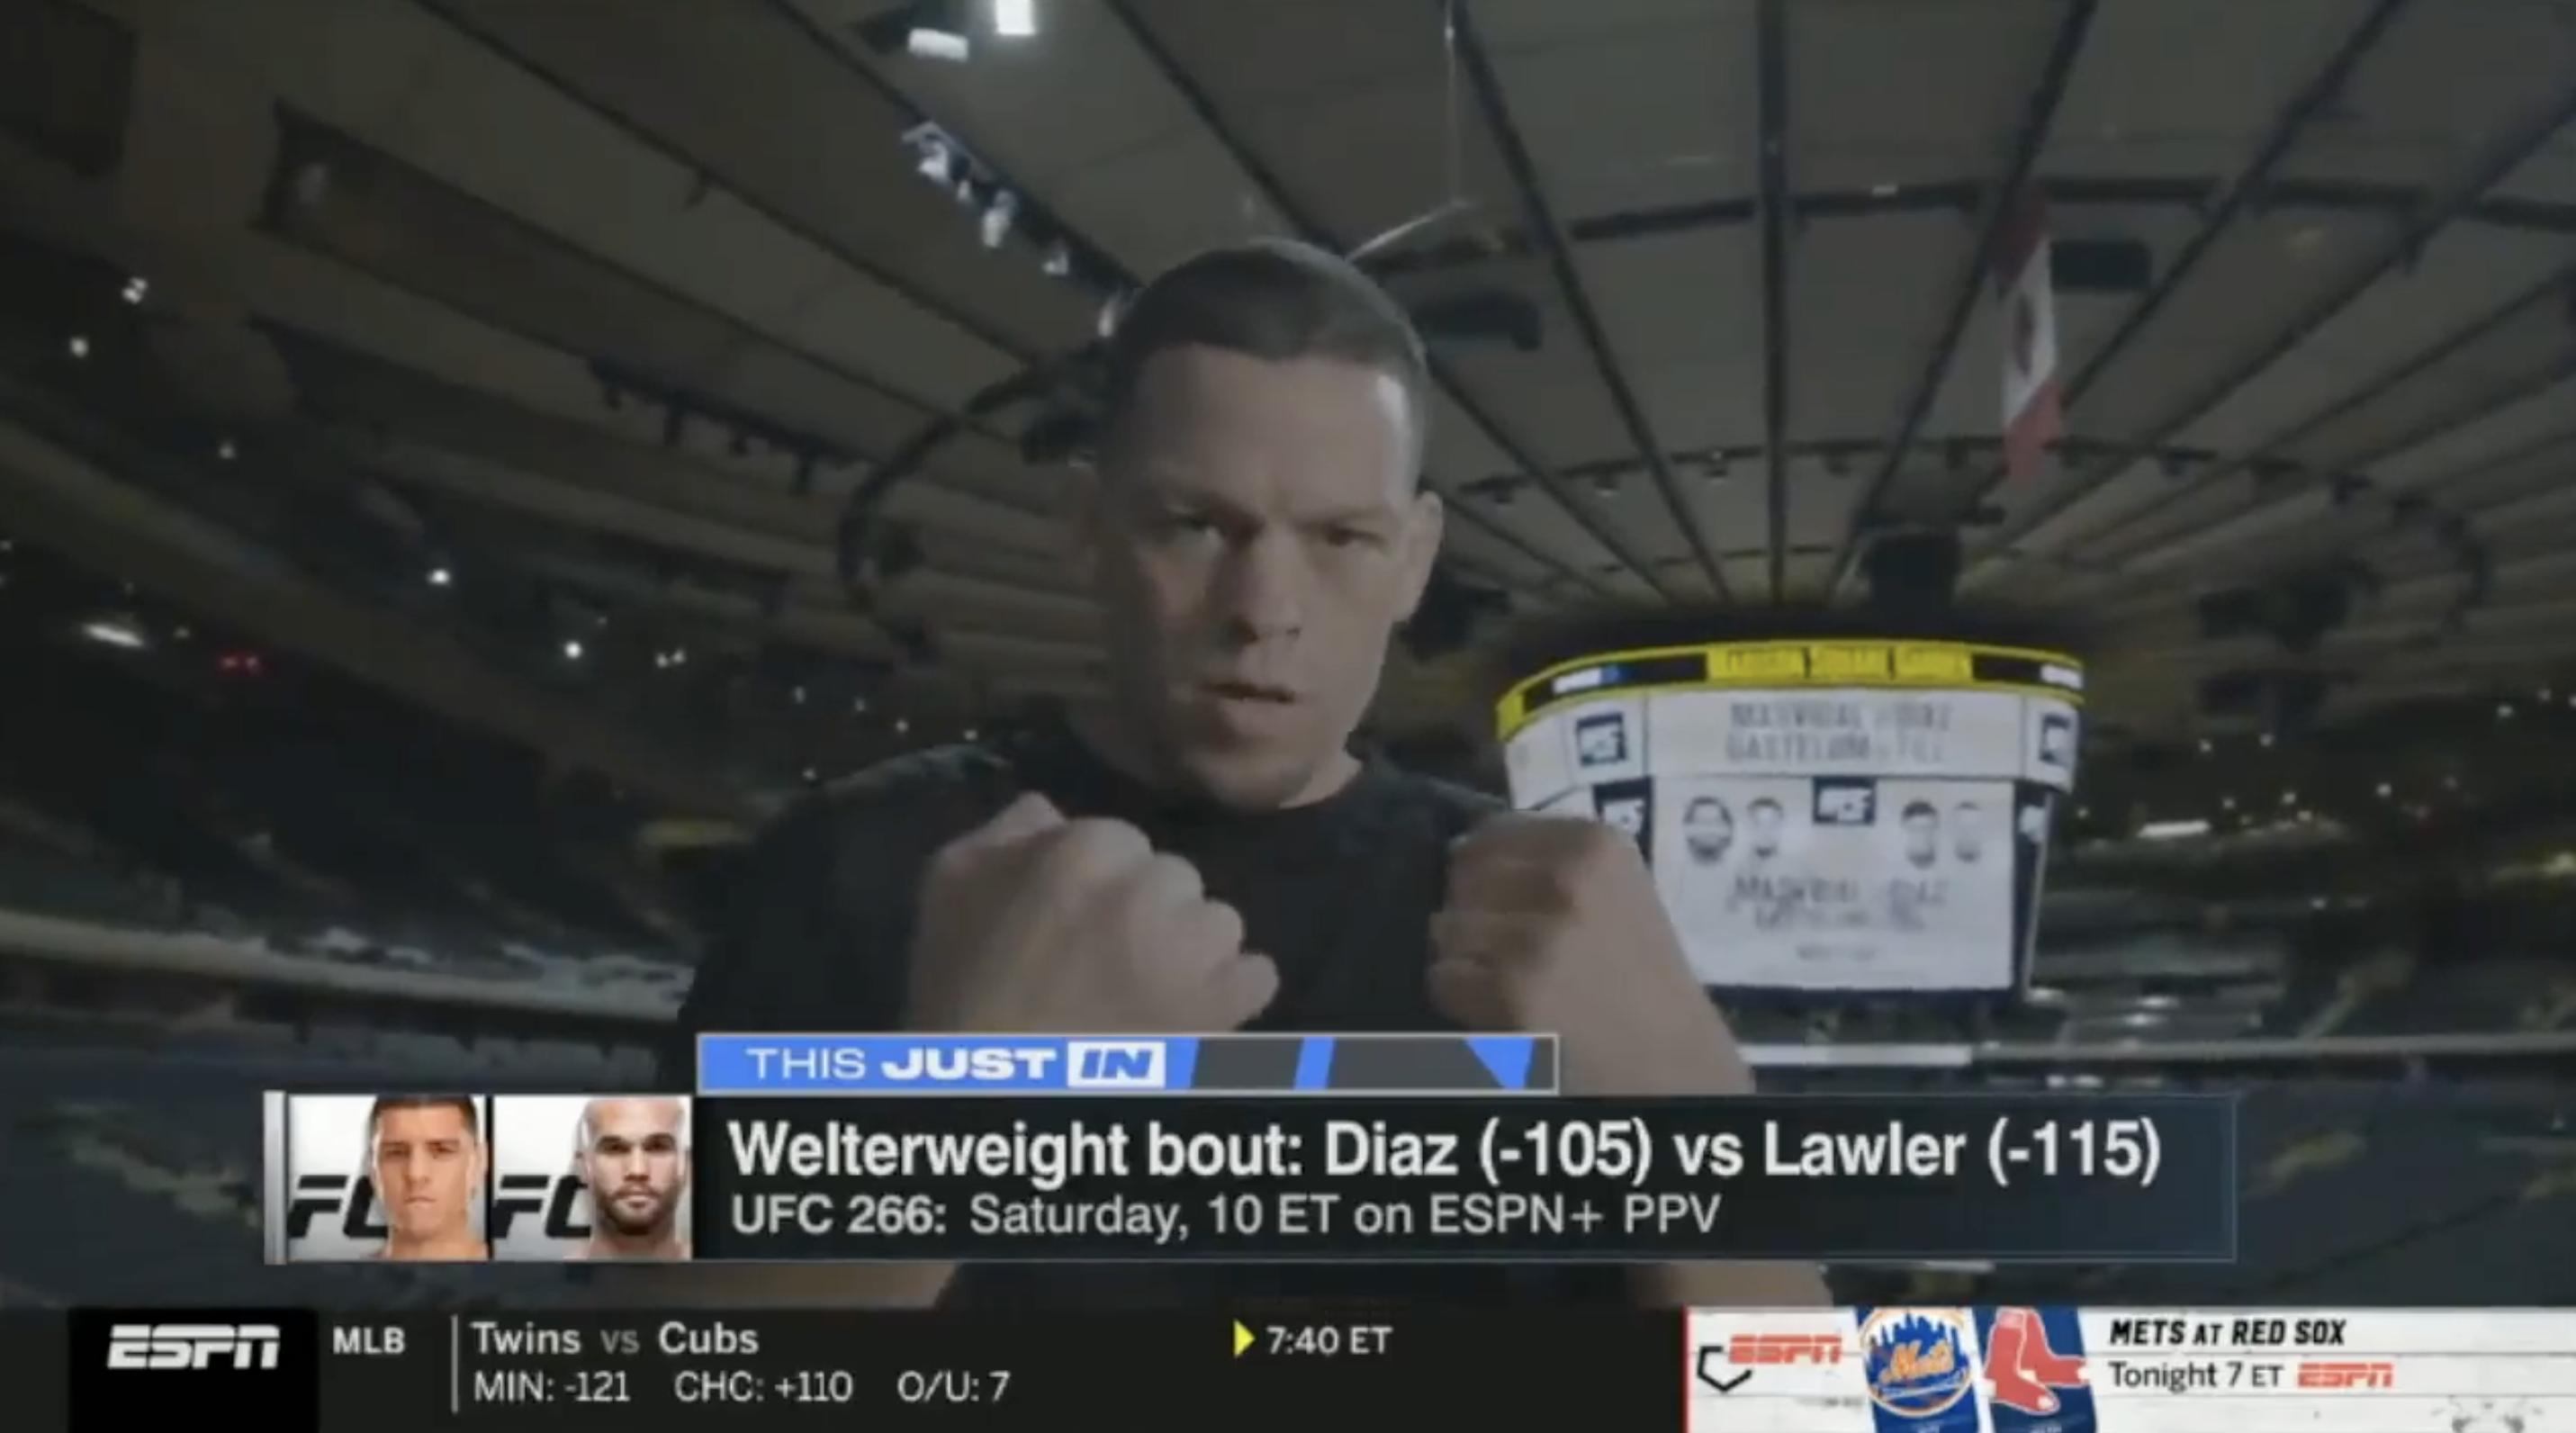 ESPN uses a photo of Nate Diaz to promote Nick Diaz vs Robbie Lawler